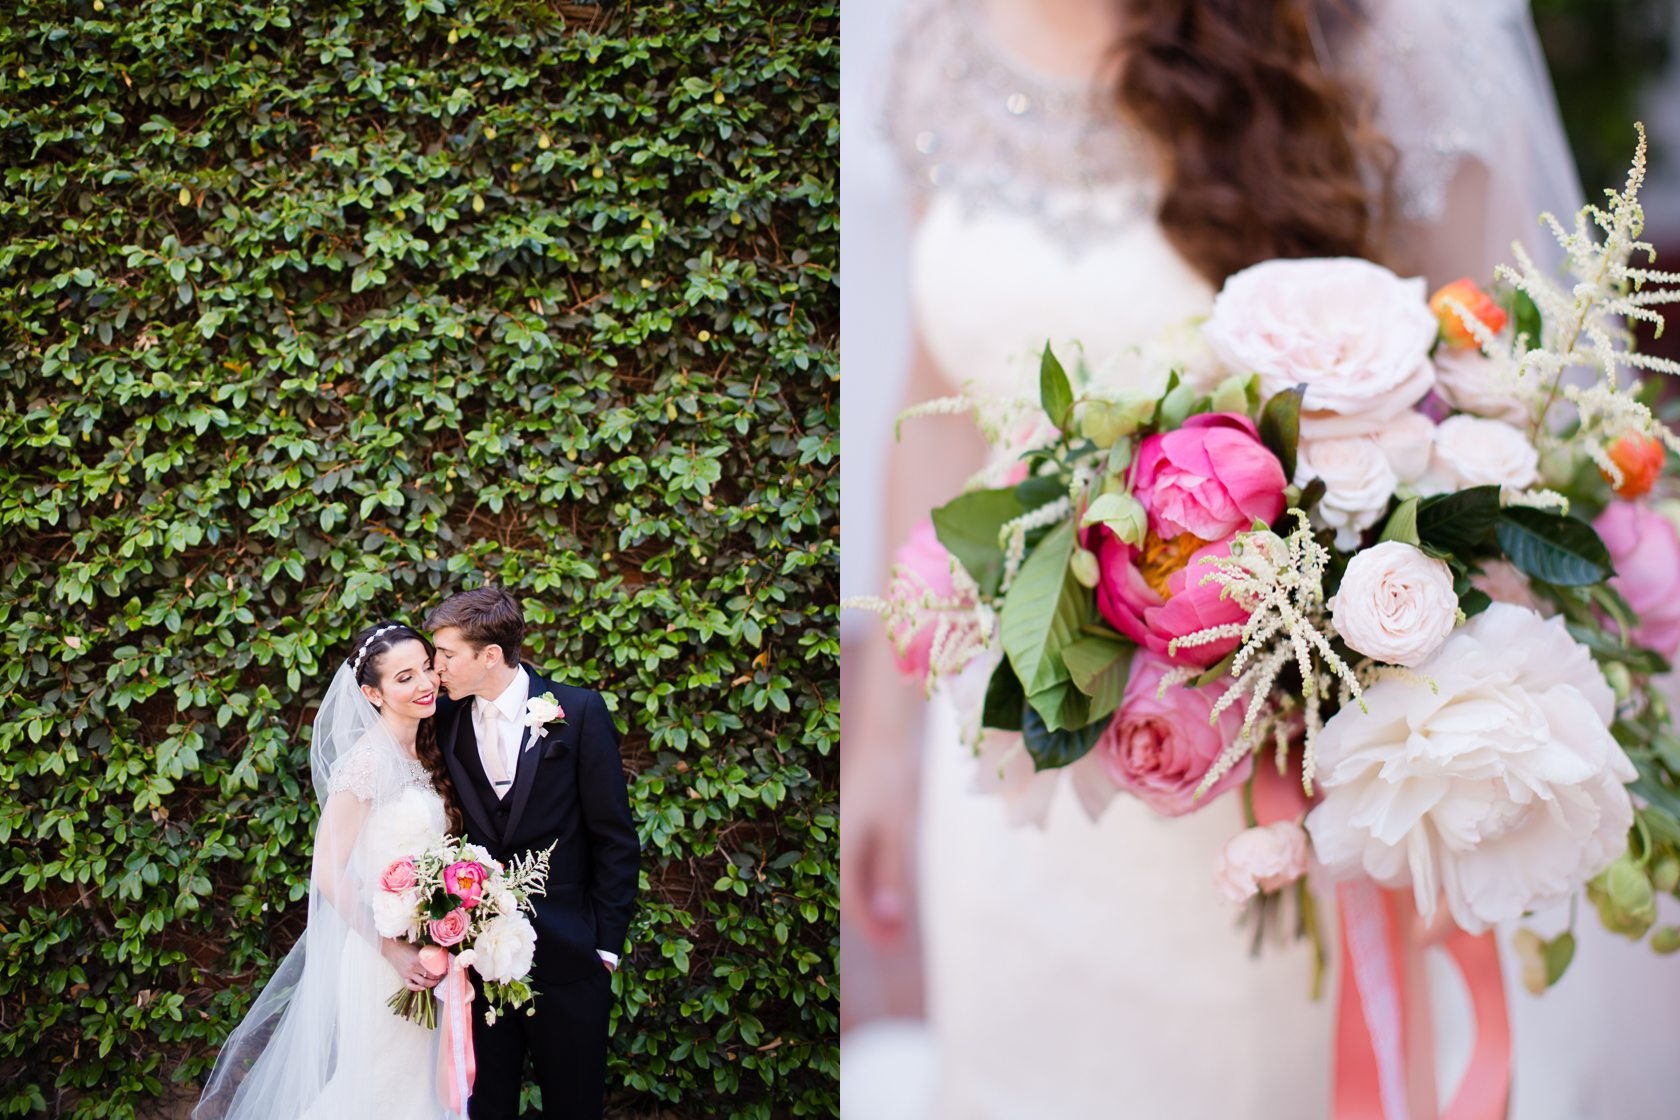 Darlington_House_Wedding_001.jpg